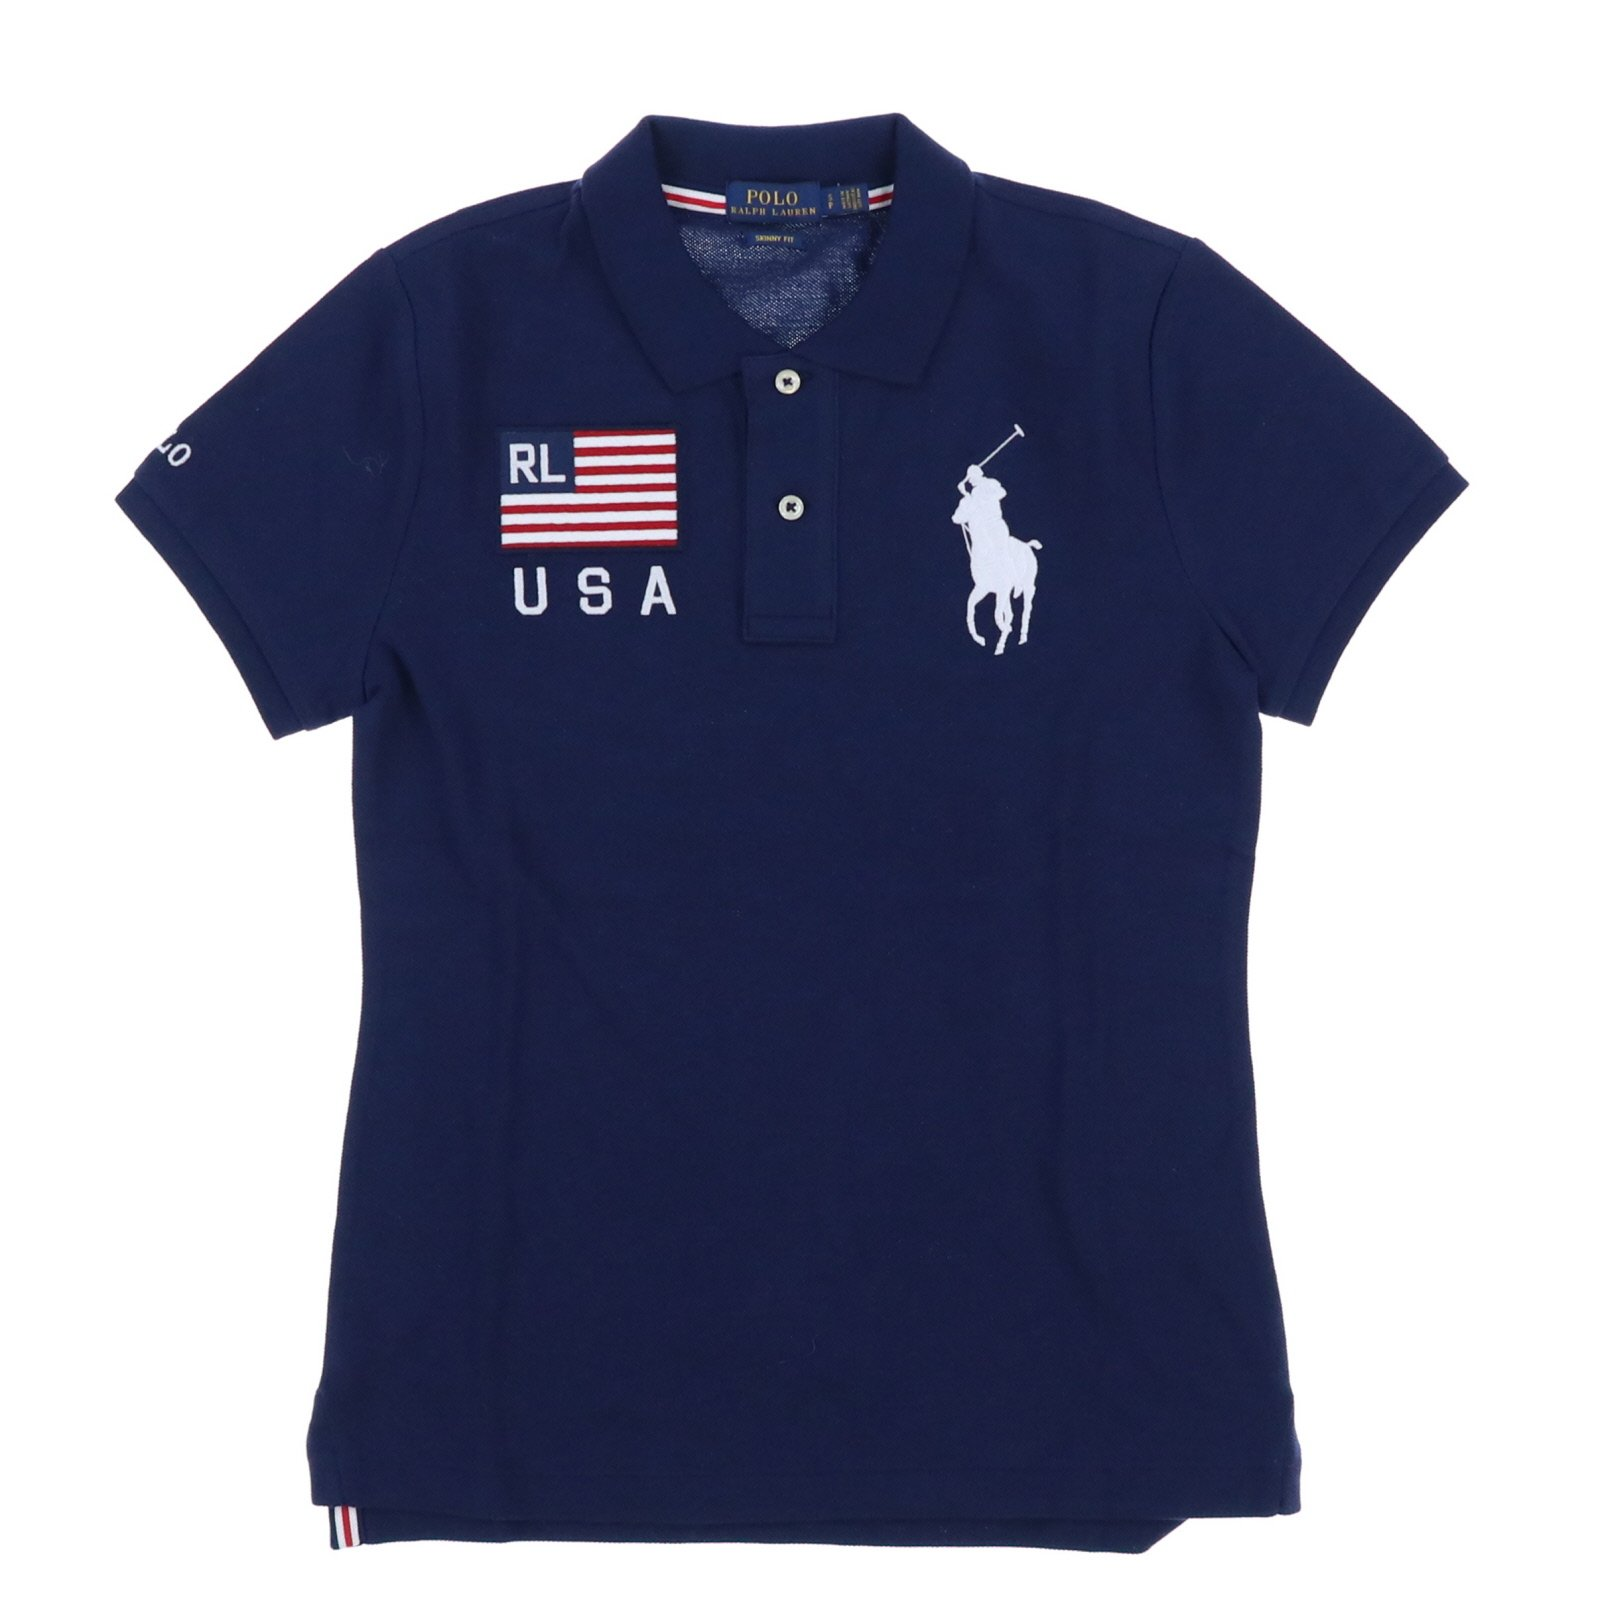 Polo Ralph Lauren Womens Skinny Fit Big Pony USA Polo Shirt (X-Small, Navy)